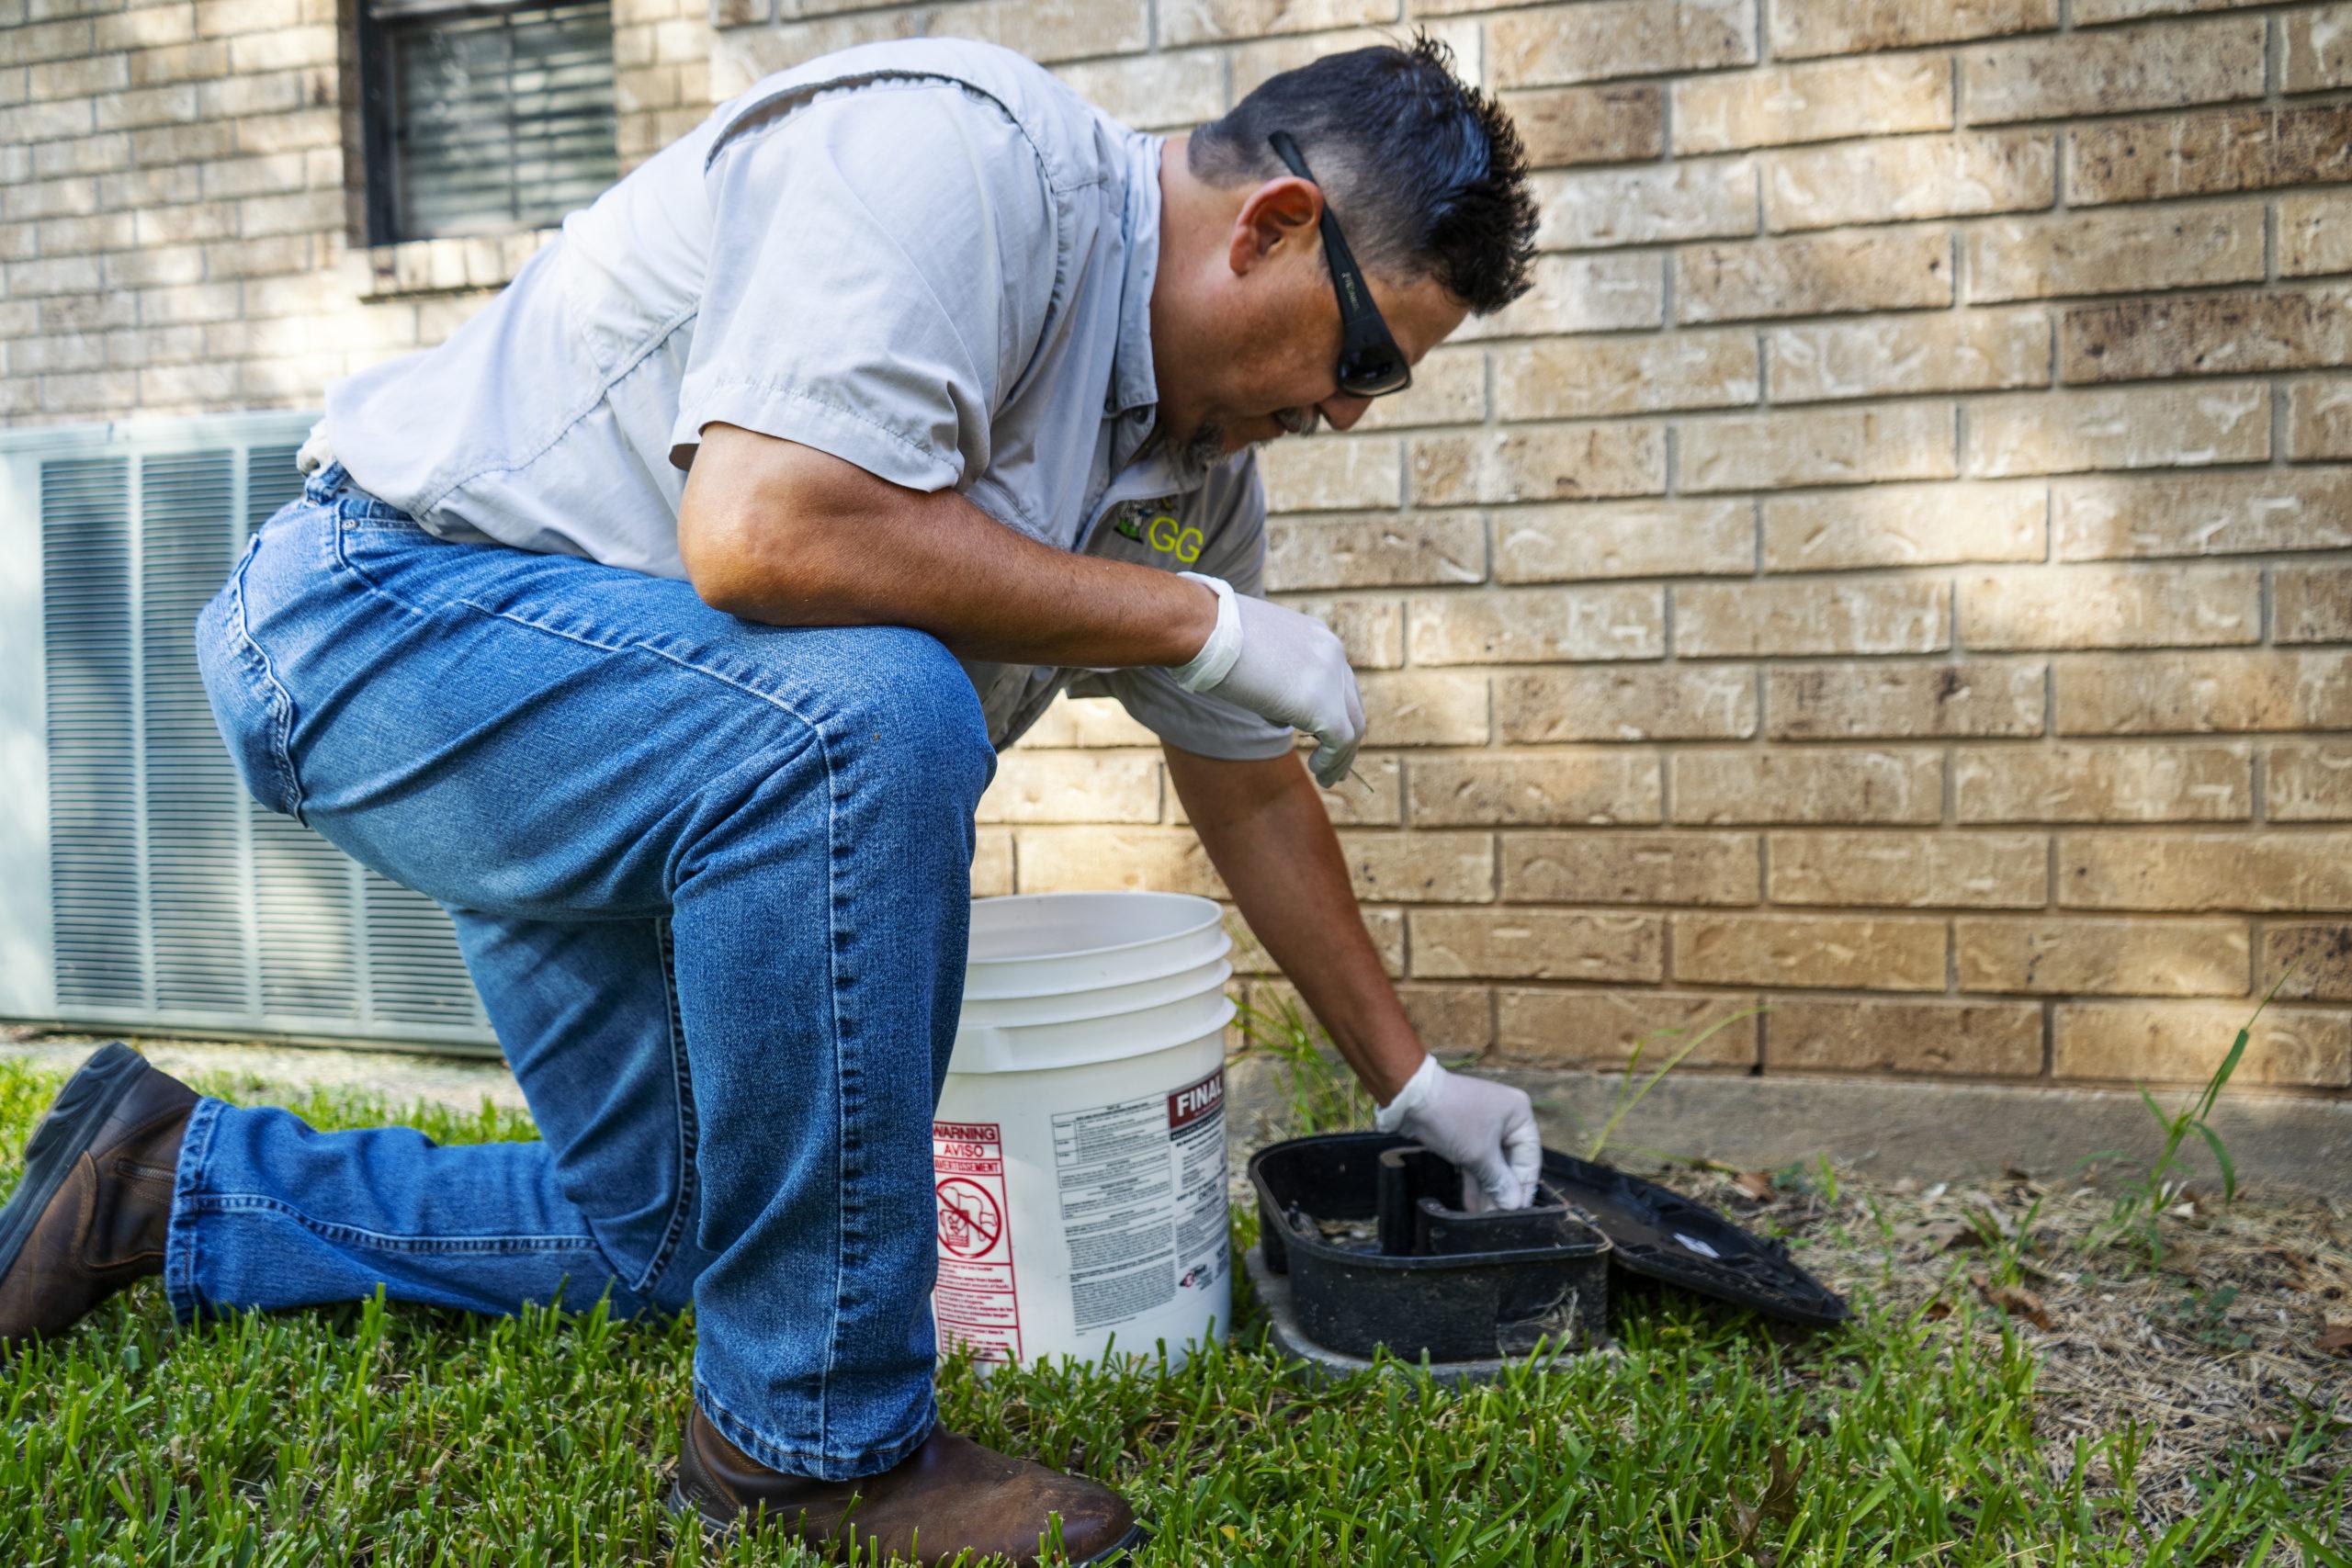 rodent control gga pest management texas